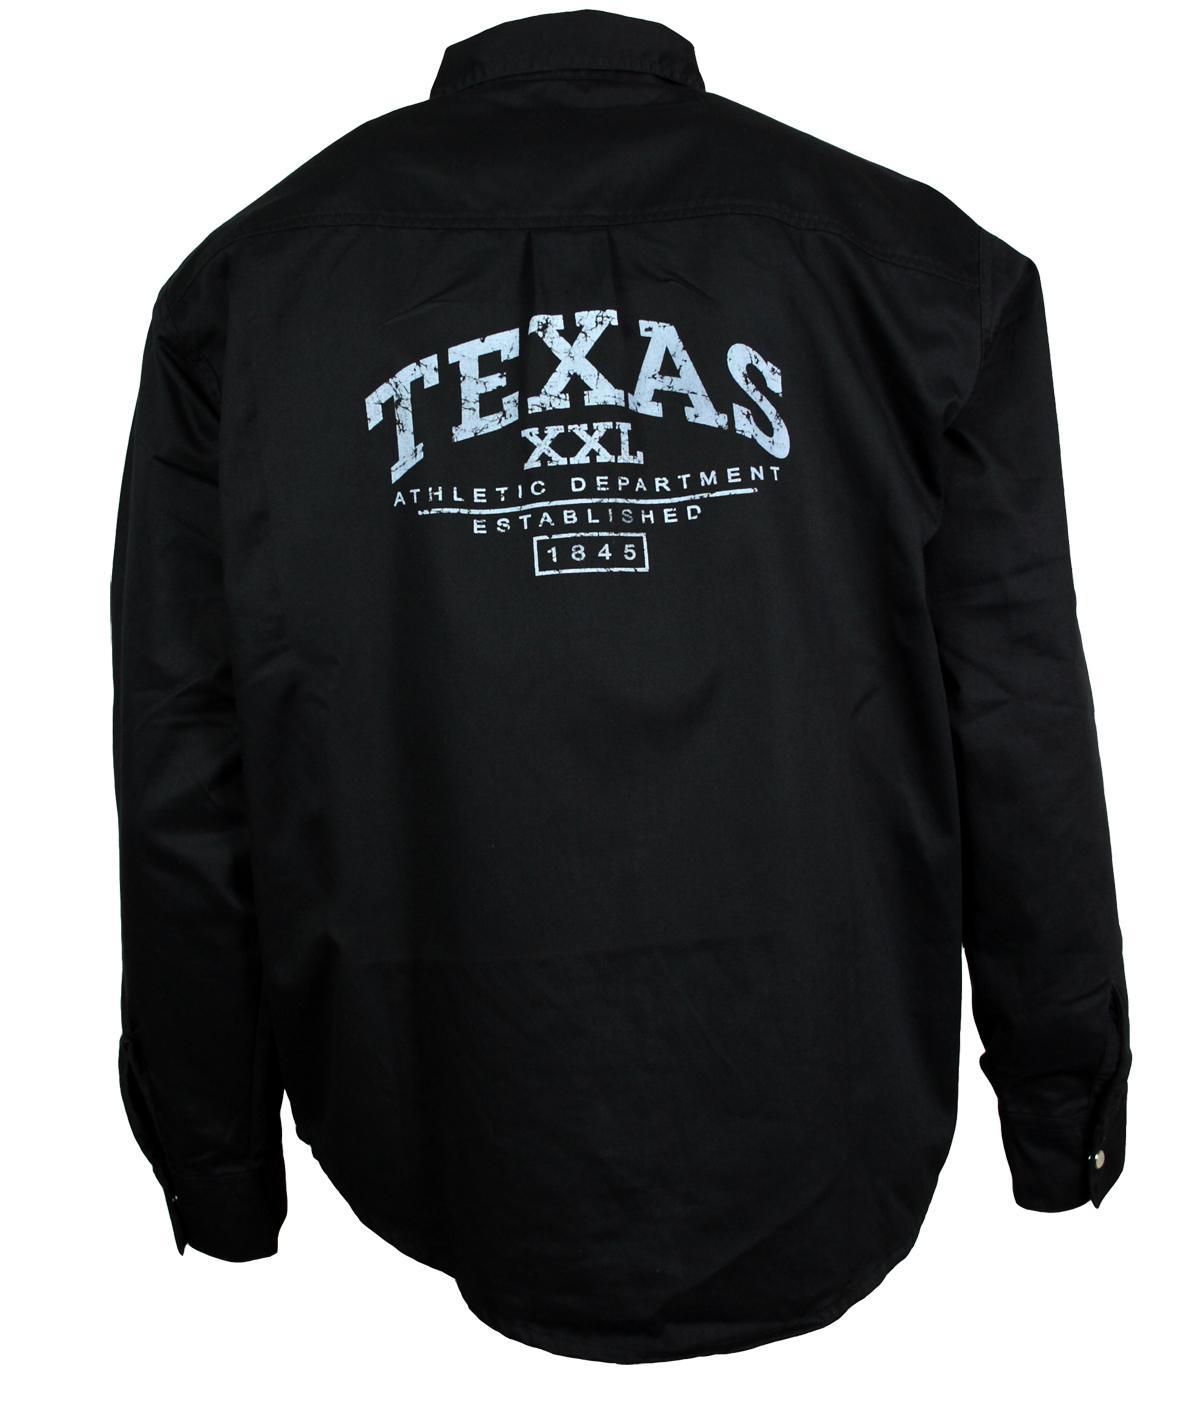 jeansartikel lederartikel strassartikel online kaufen jeanshemd texas schwarz. Black Bedroom Furniture Sets. Home Design Ideas